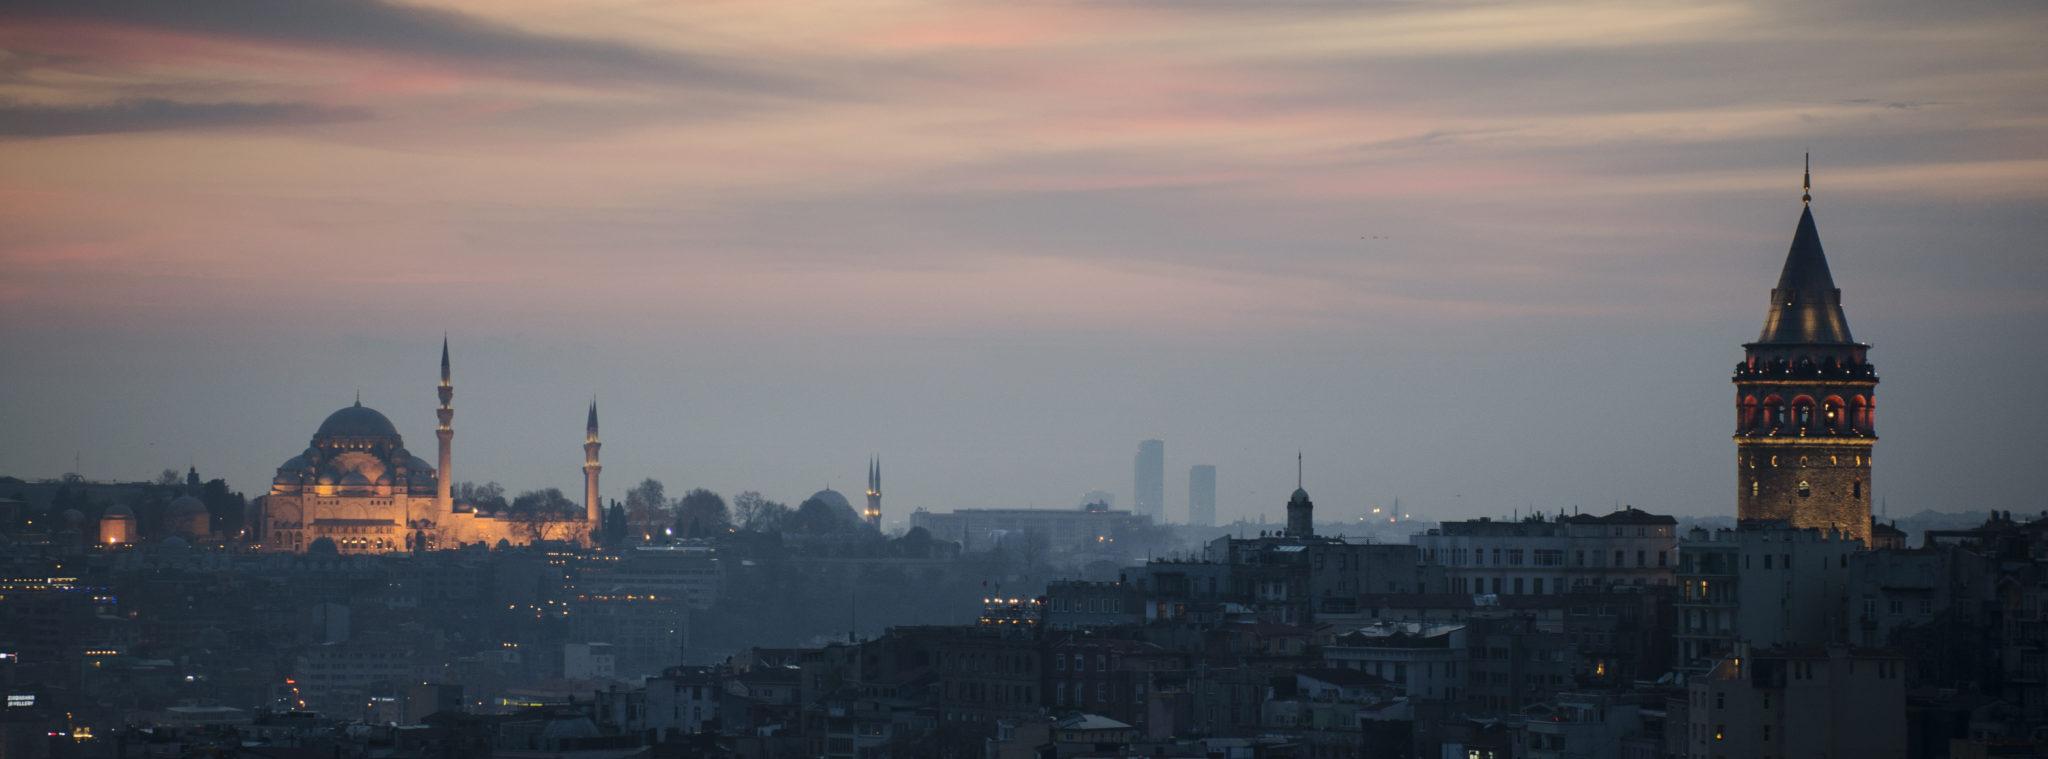 Tuerkei-Sehenswuerdigkeiten-Istanbul-Galata-Turm-Slider